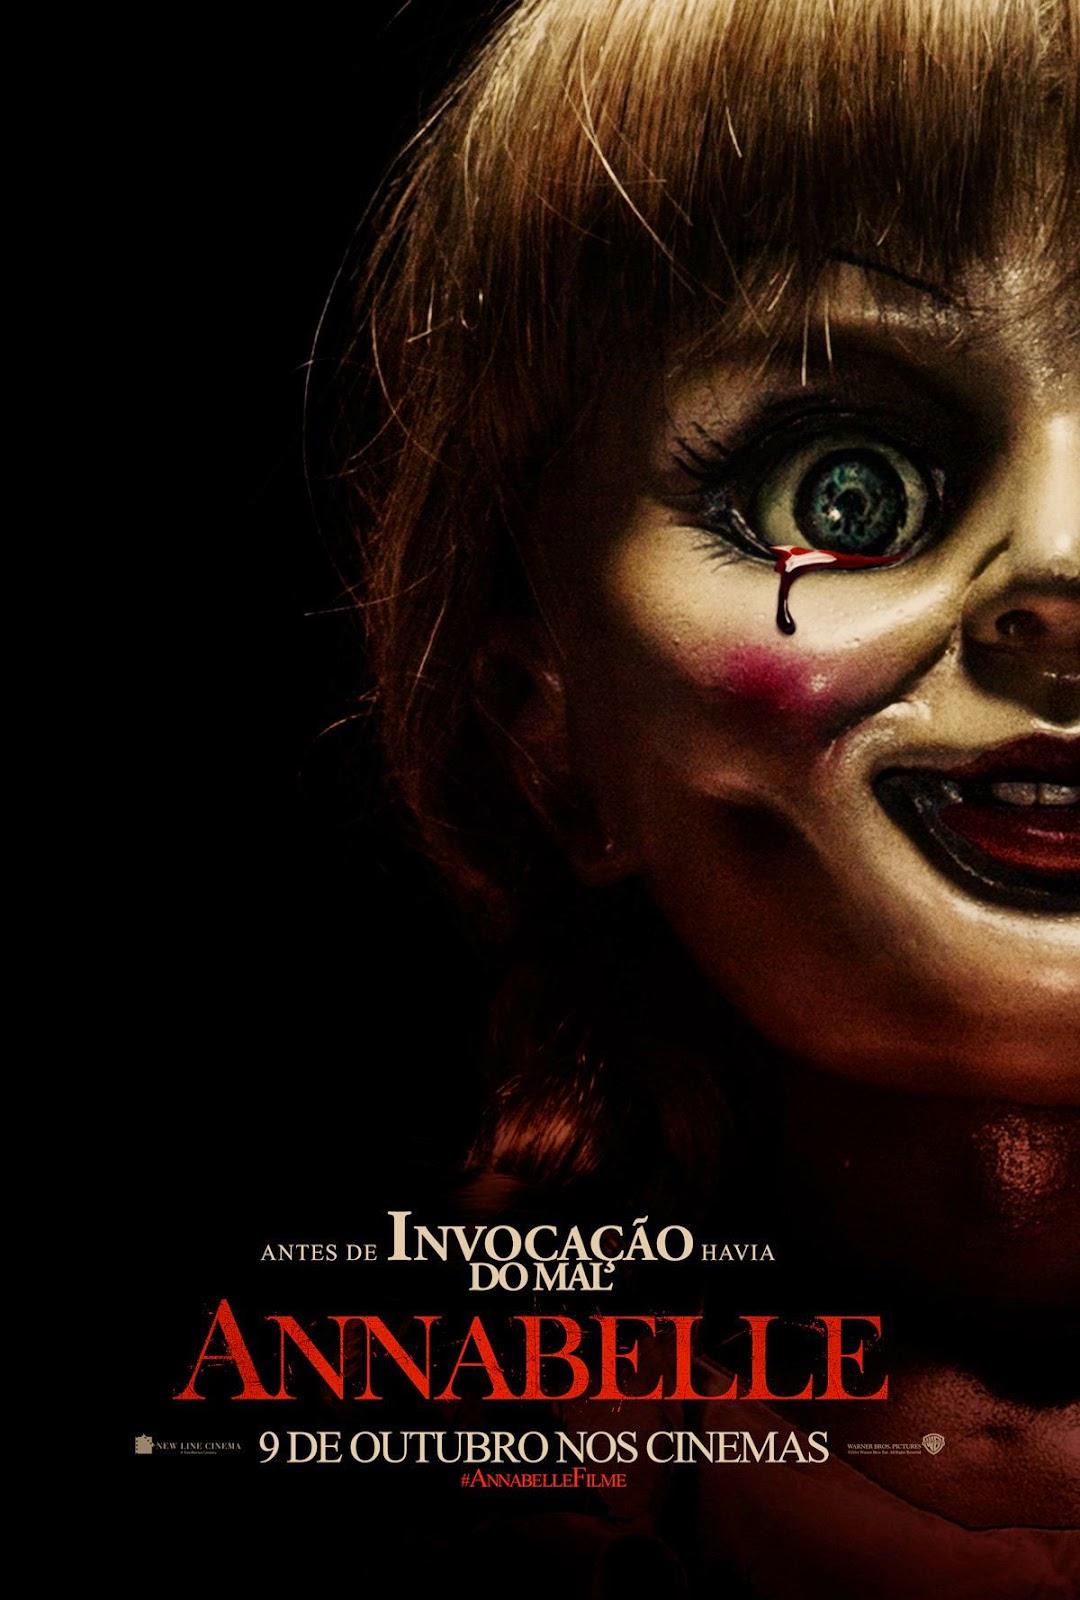 Annabelle (2014) ตุ๊กตาผี [HD]